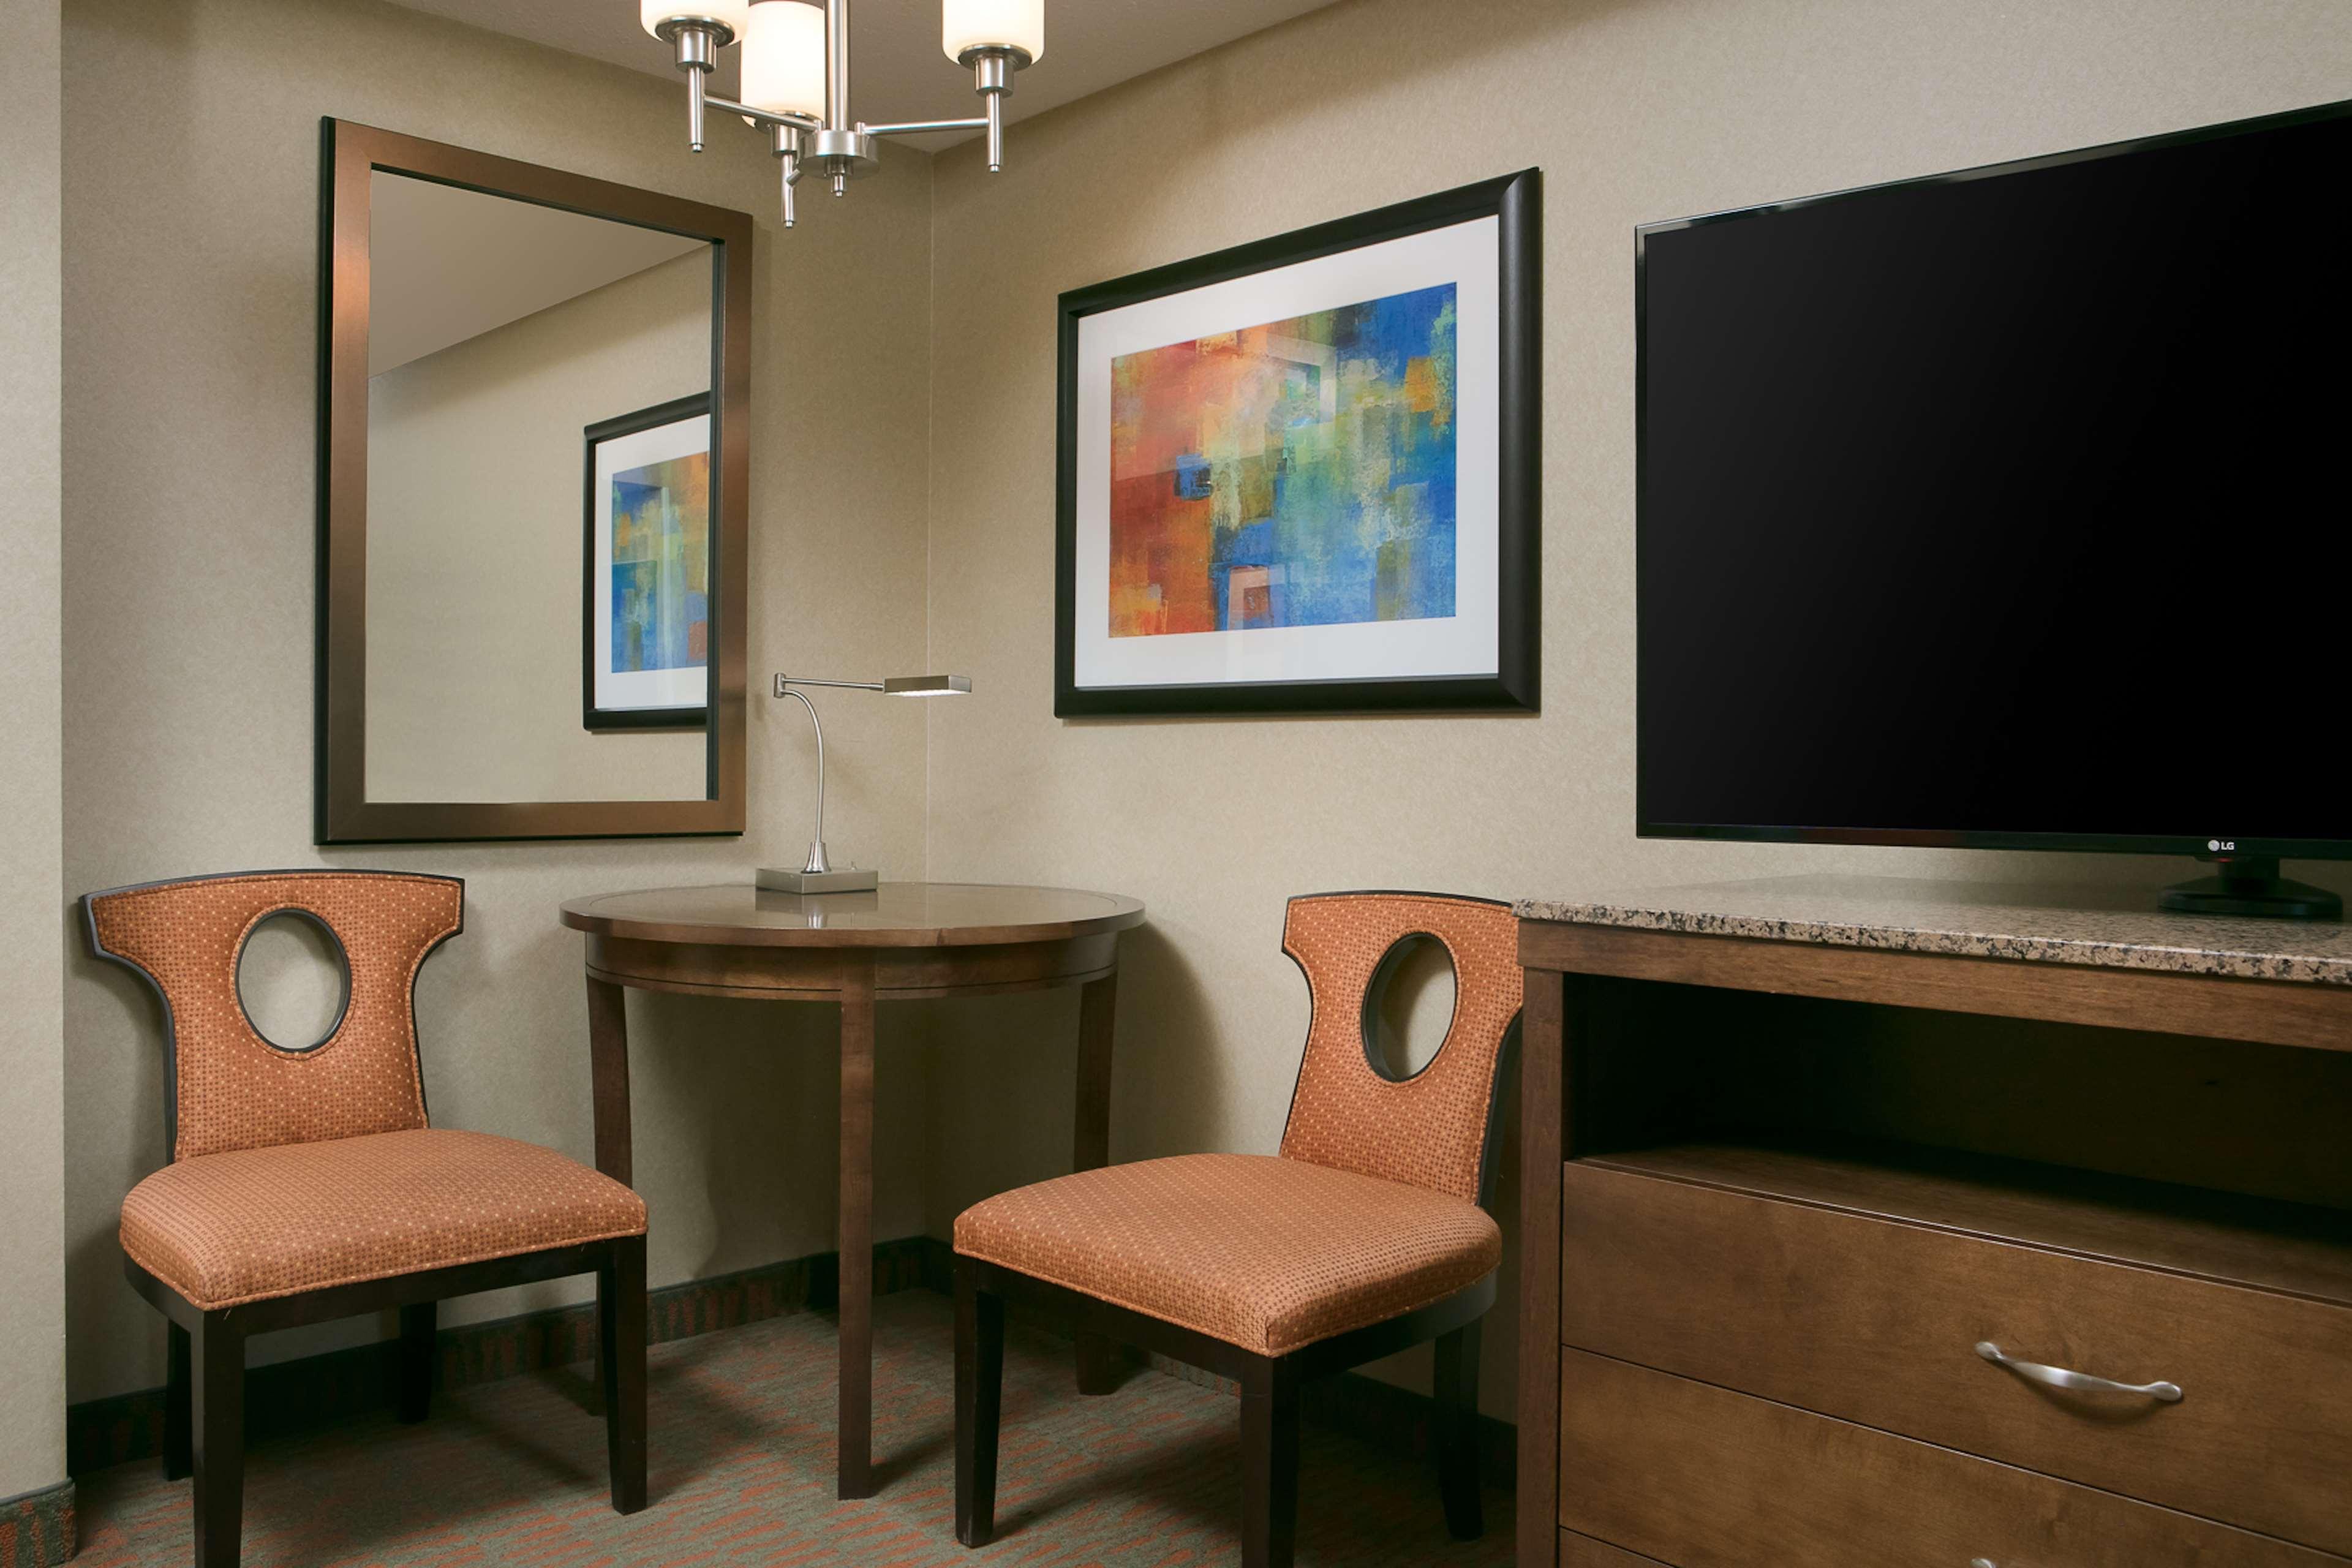 Hilton Garden Inn Manhattan image 6